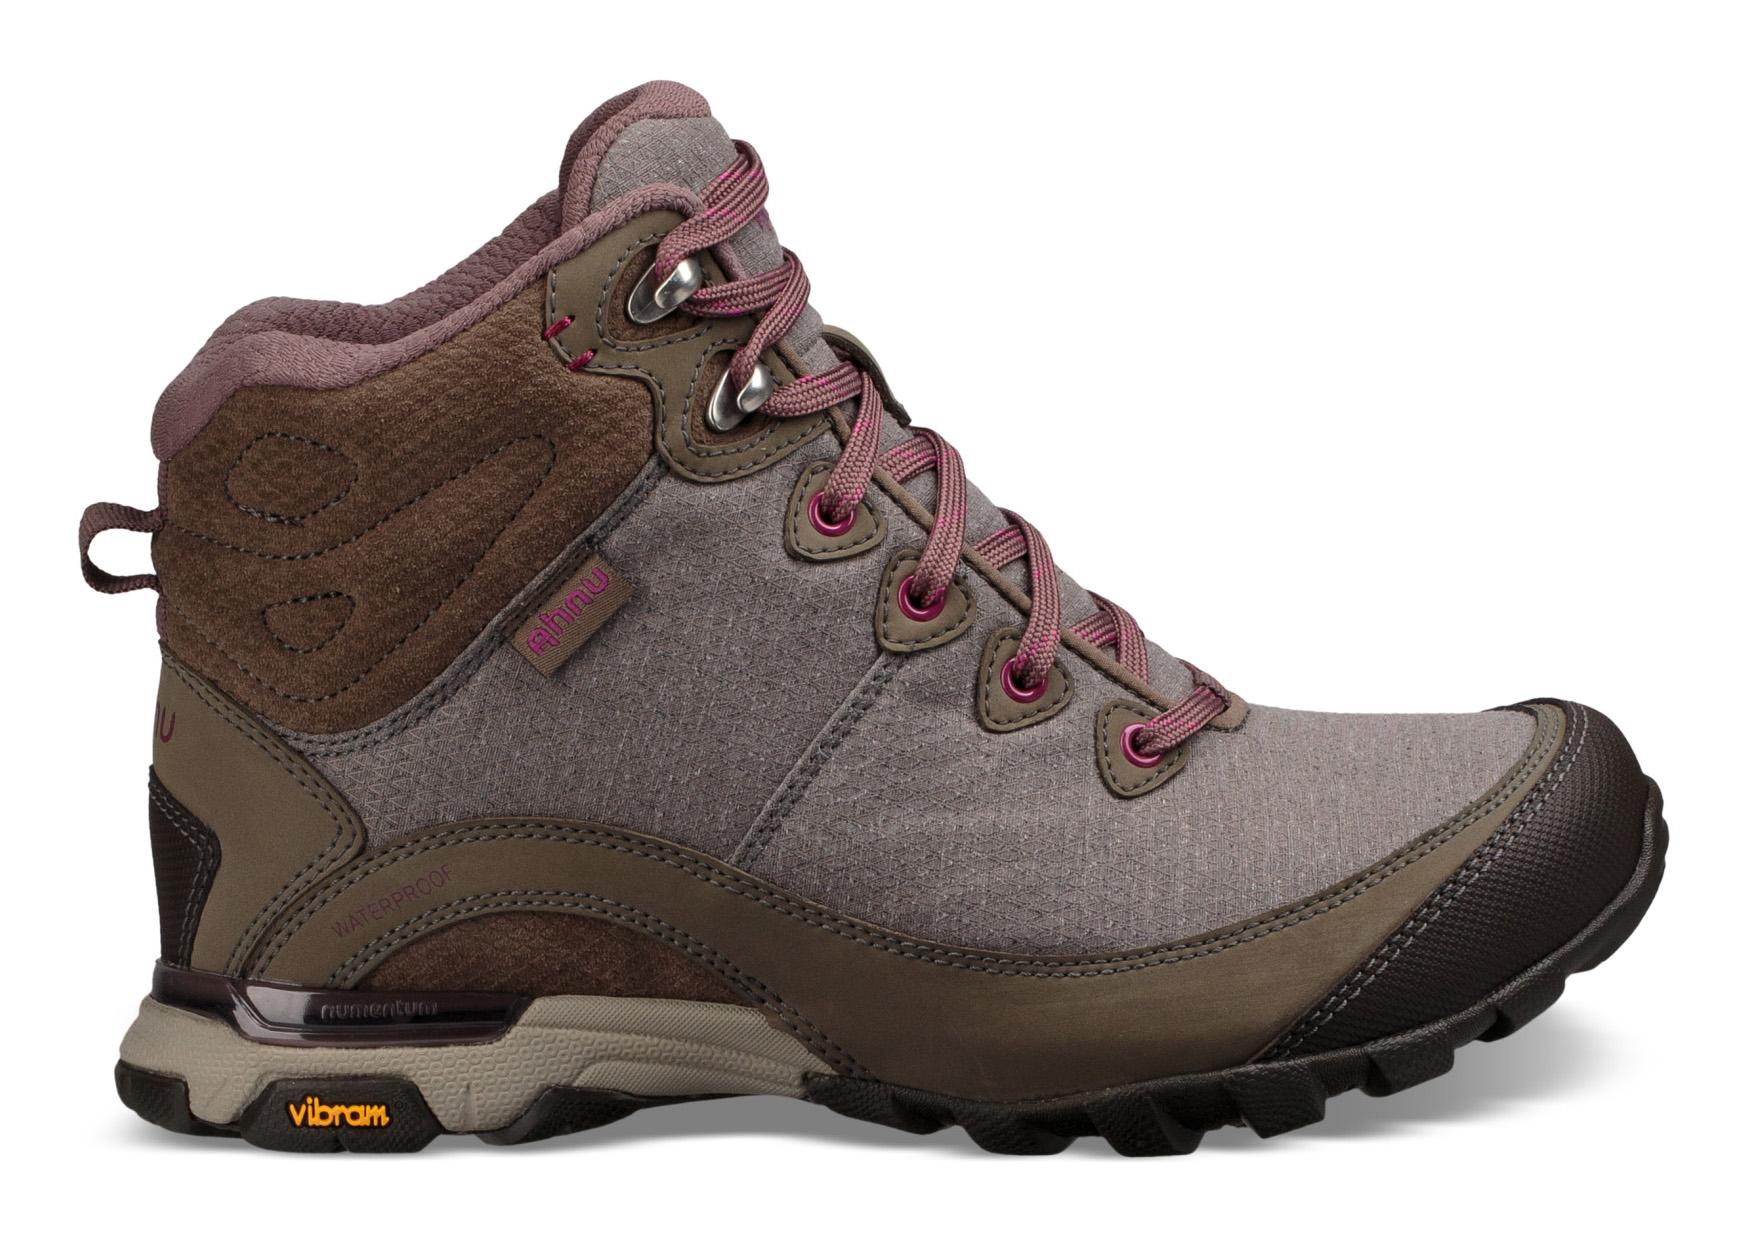 8eddb7b3c Teva Sugarpine II Waterproof Boot - Women s